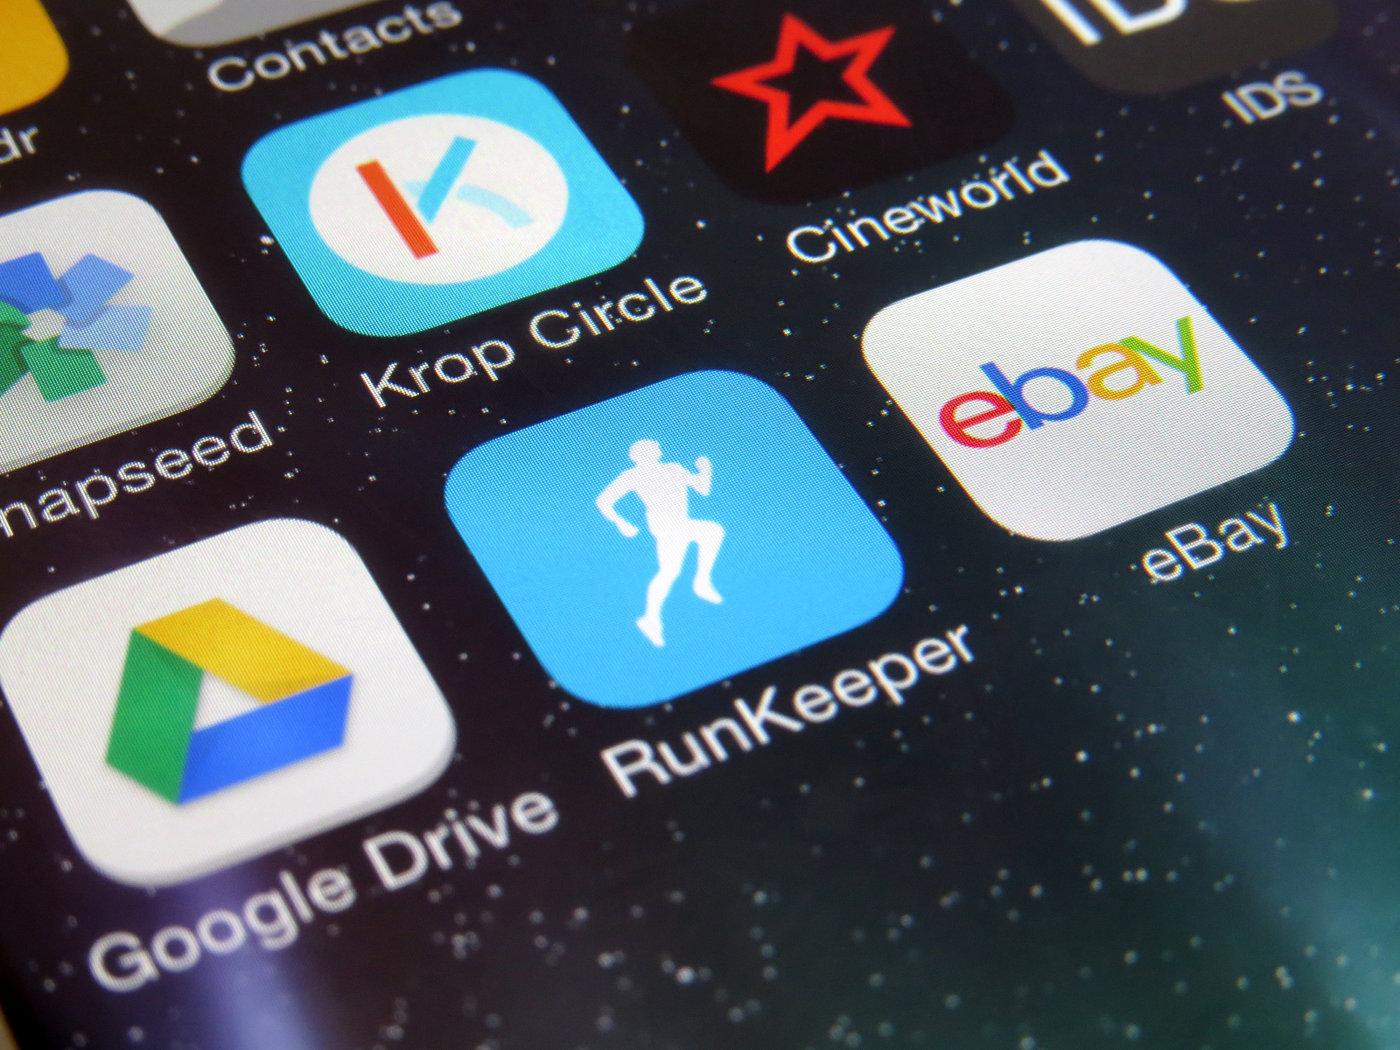 ASICS compra Runkeeper y sigue el ritmo de sus rivales